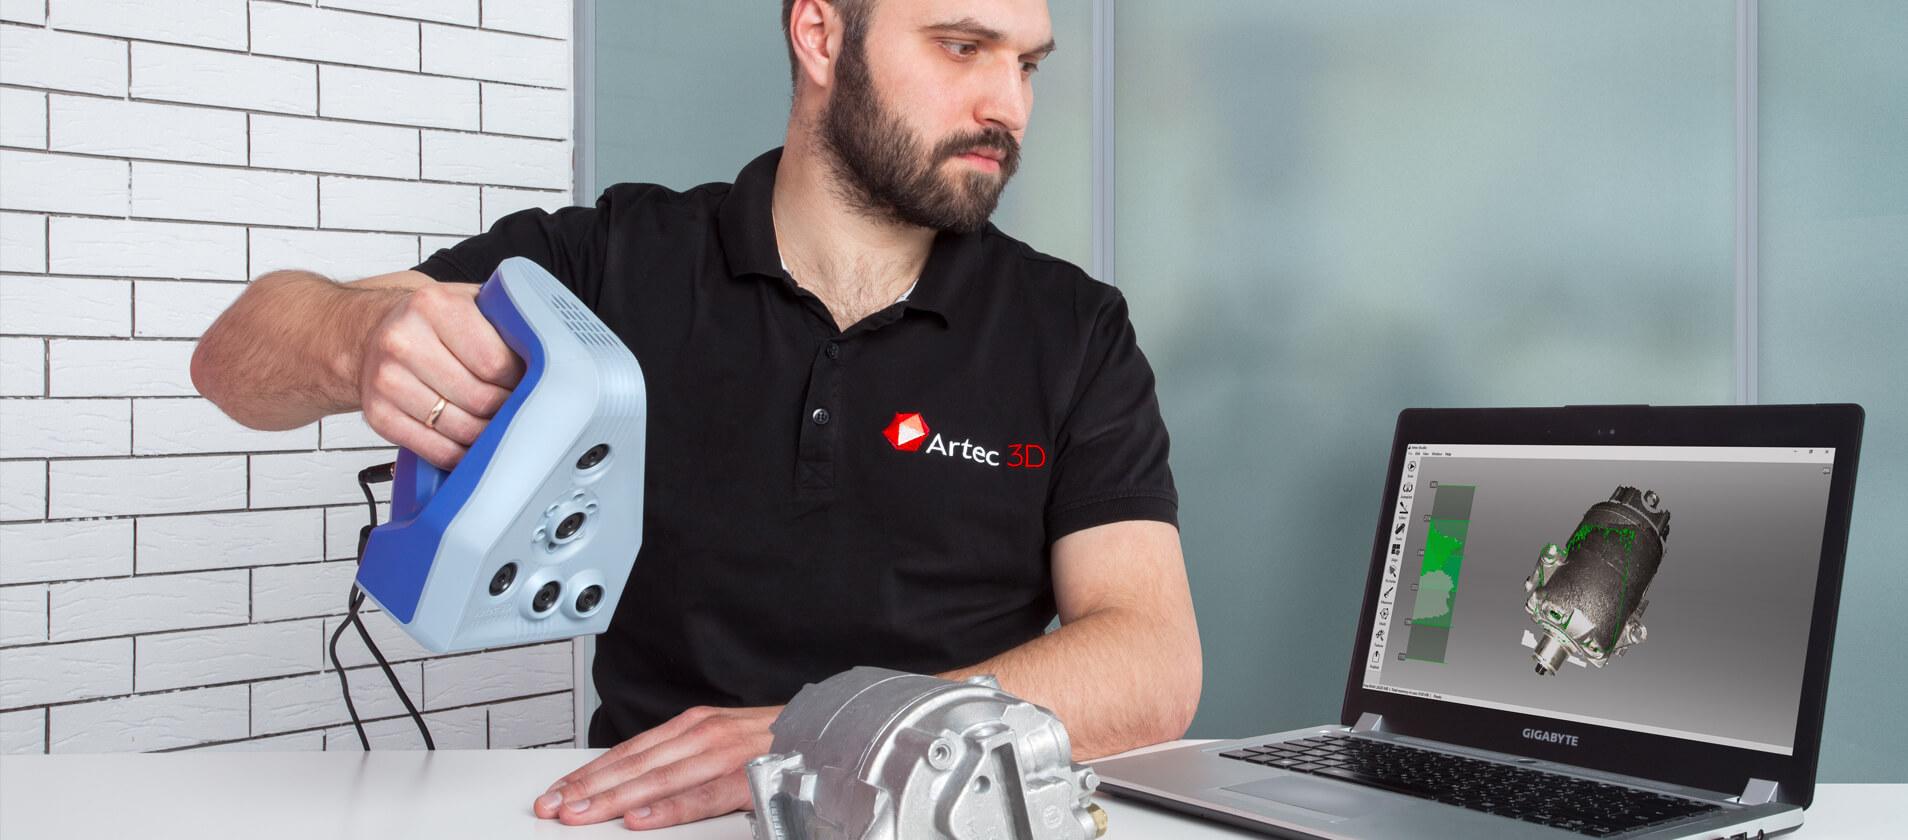 Skanowanie skanerem 3D Leo - Artec 3D